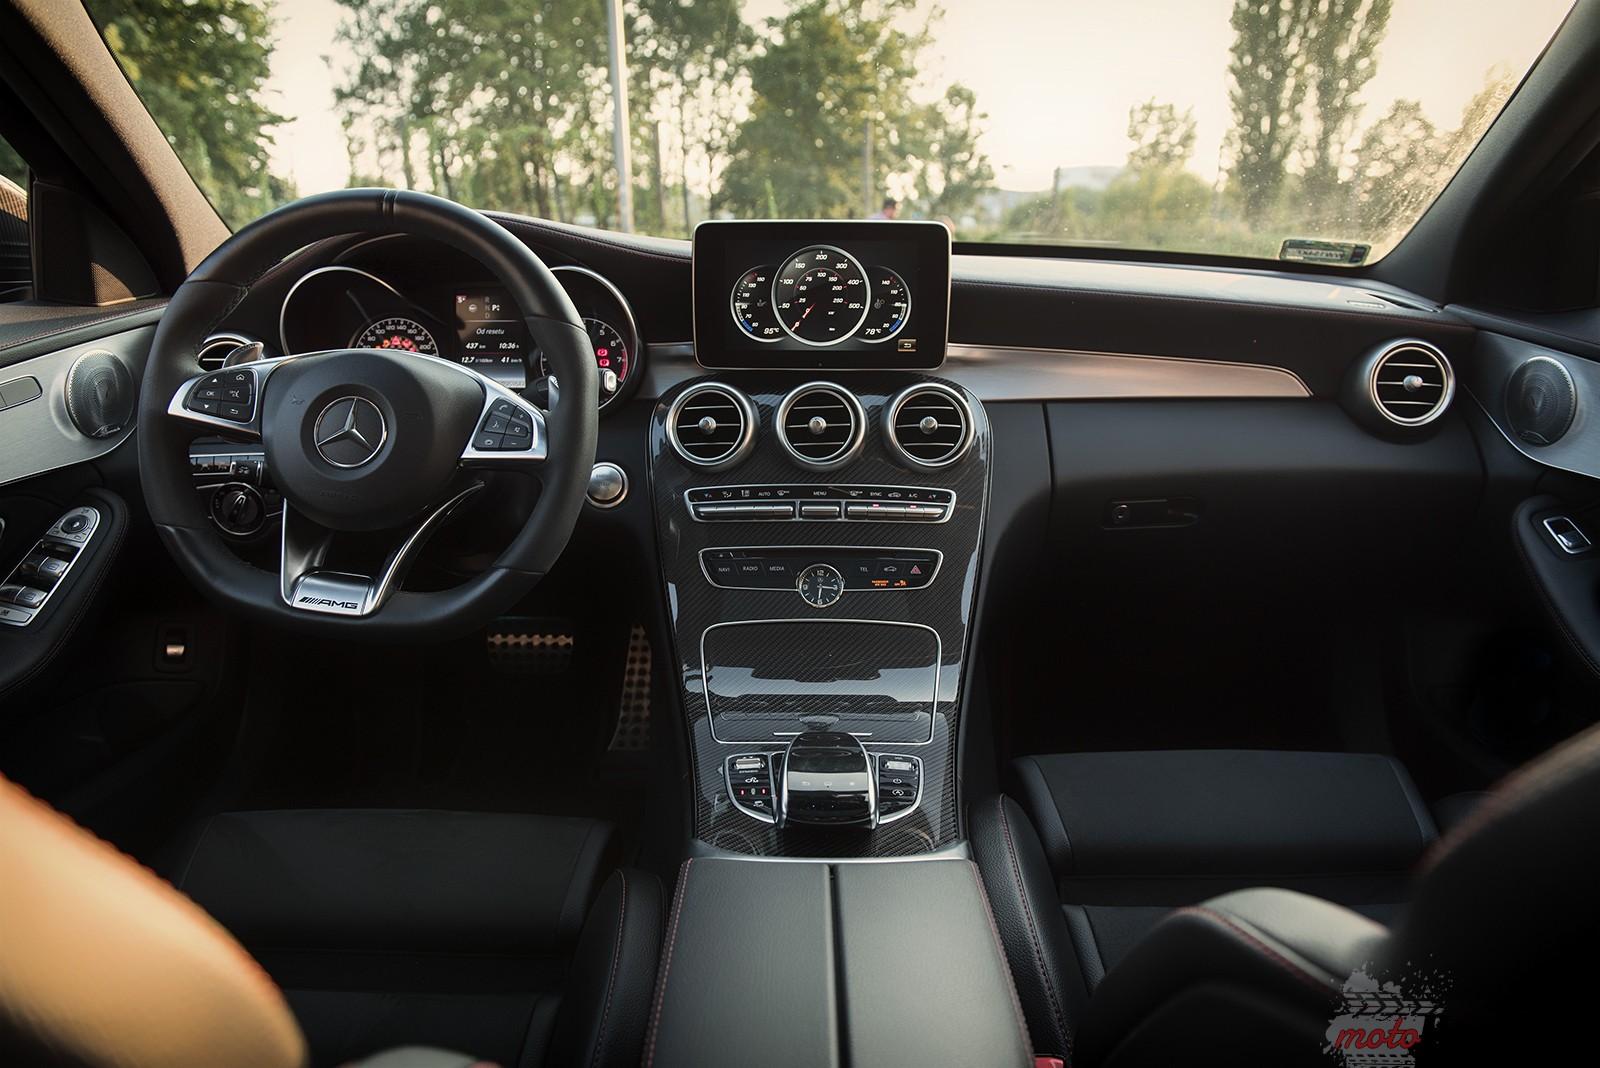 Mercedes C450 AMG 9 Test: Mercedes C450 AMG   lekko przykurzony mocarz